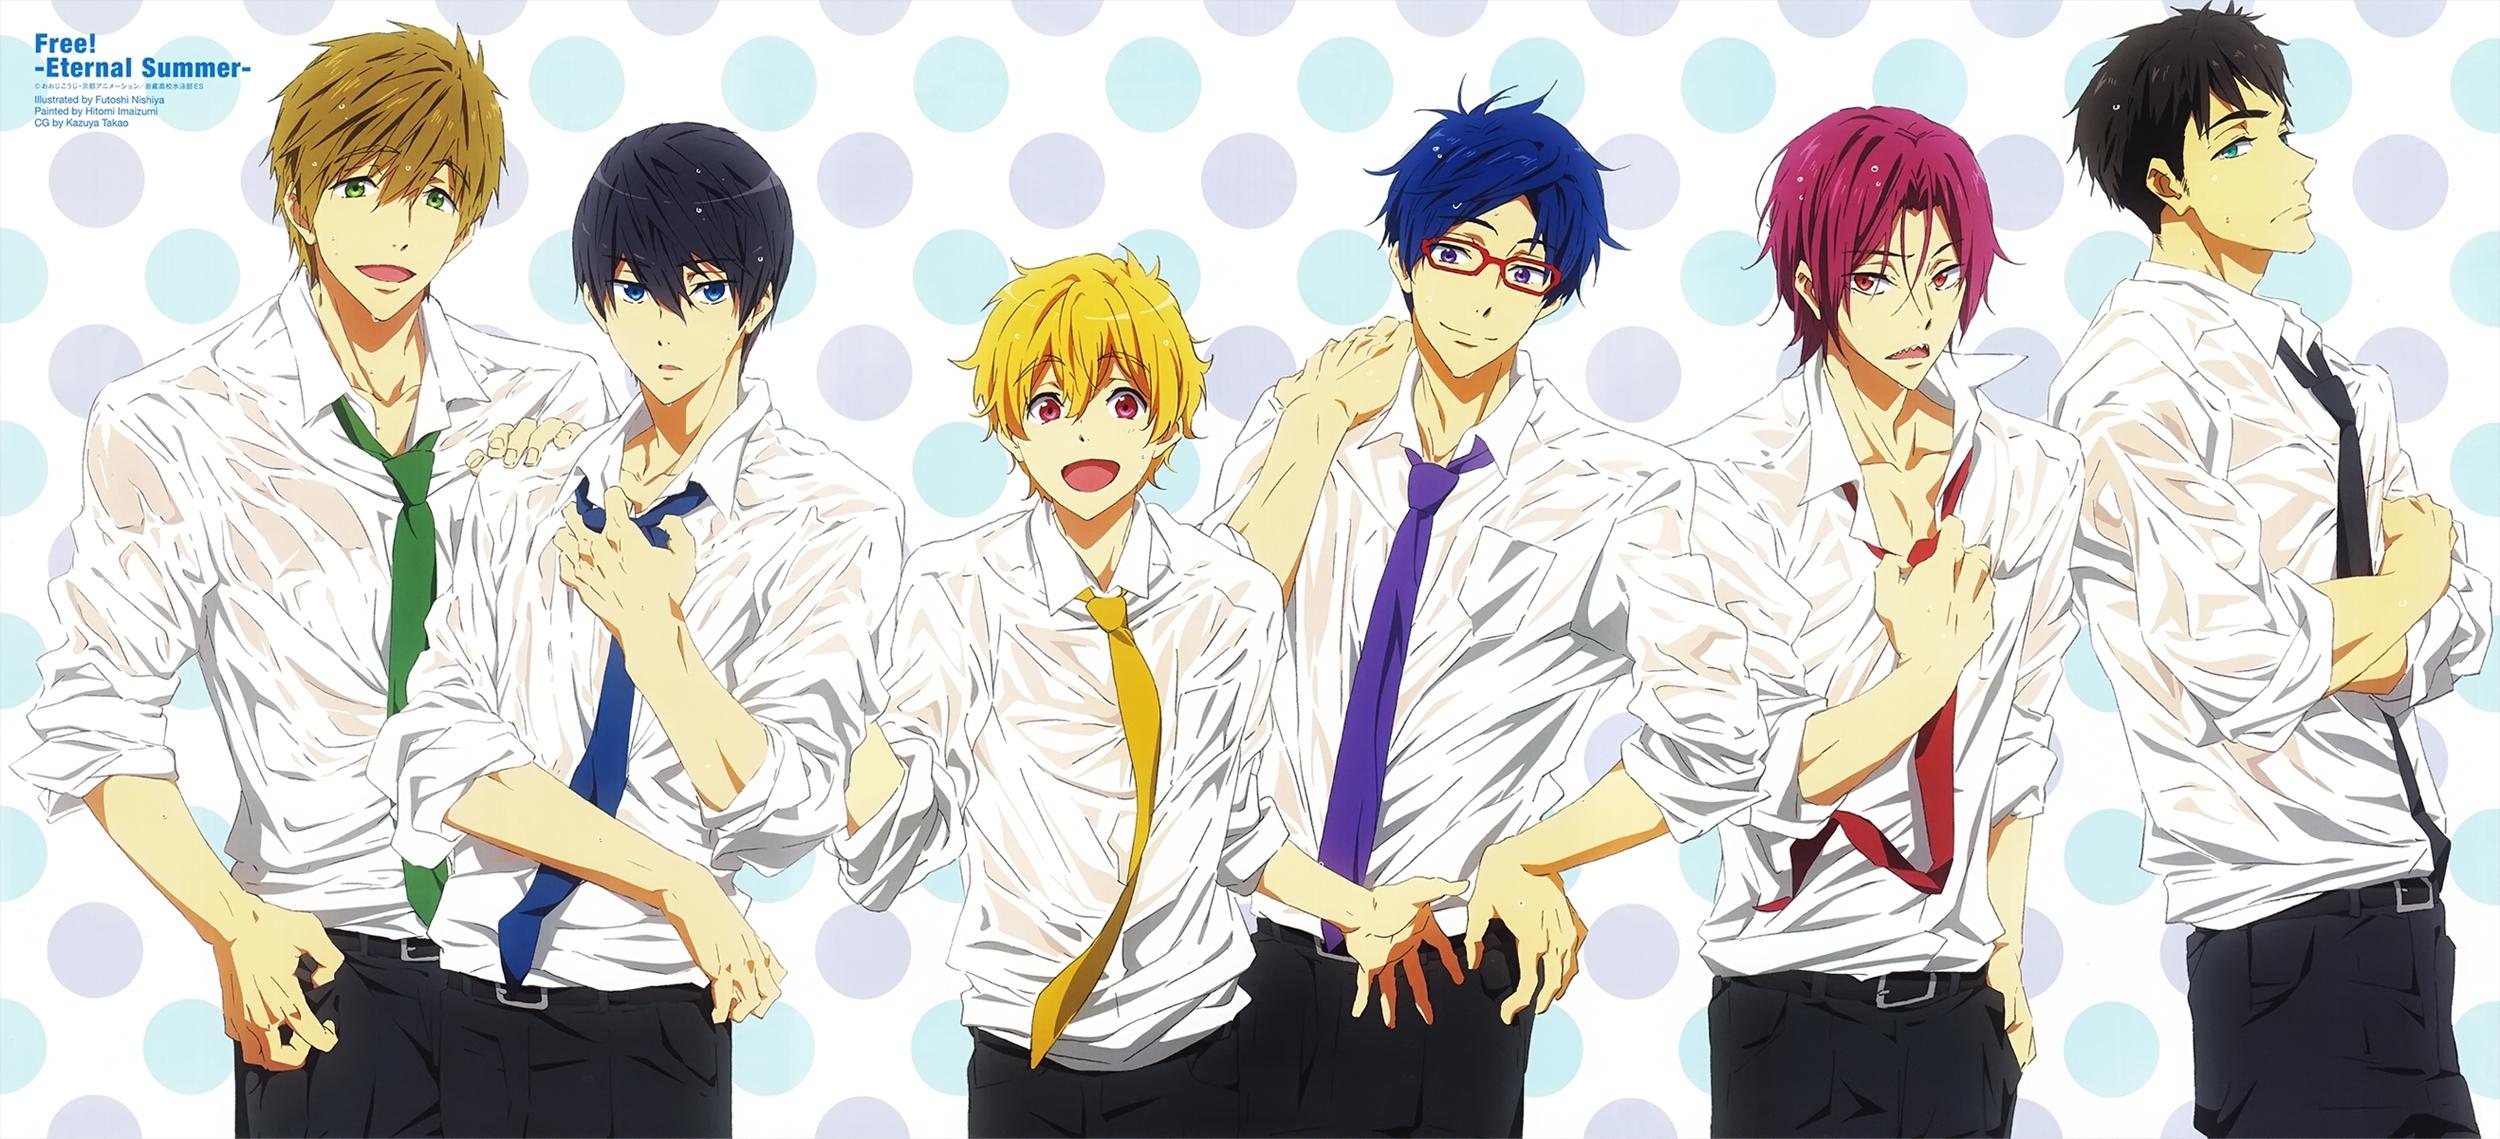 Anime Free Wallpaper Resolution 2500x1139 Id 913694 Wallha Com